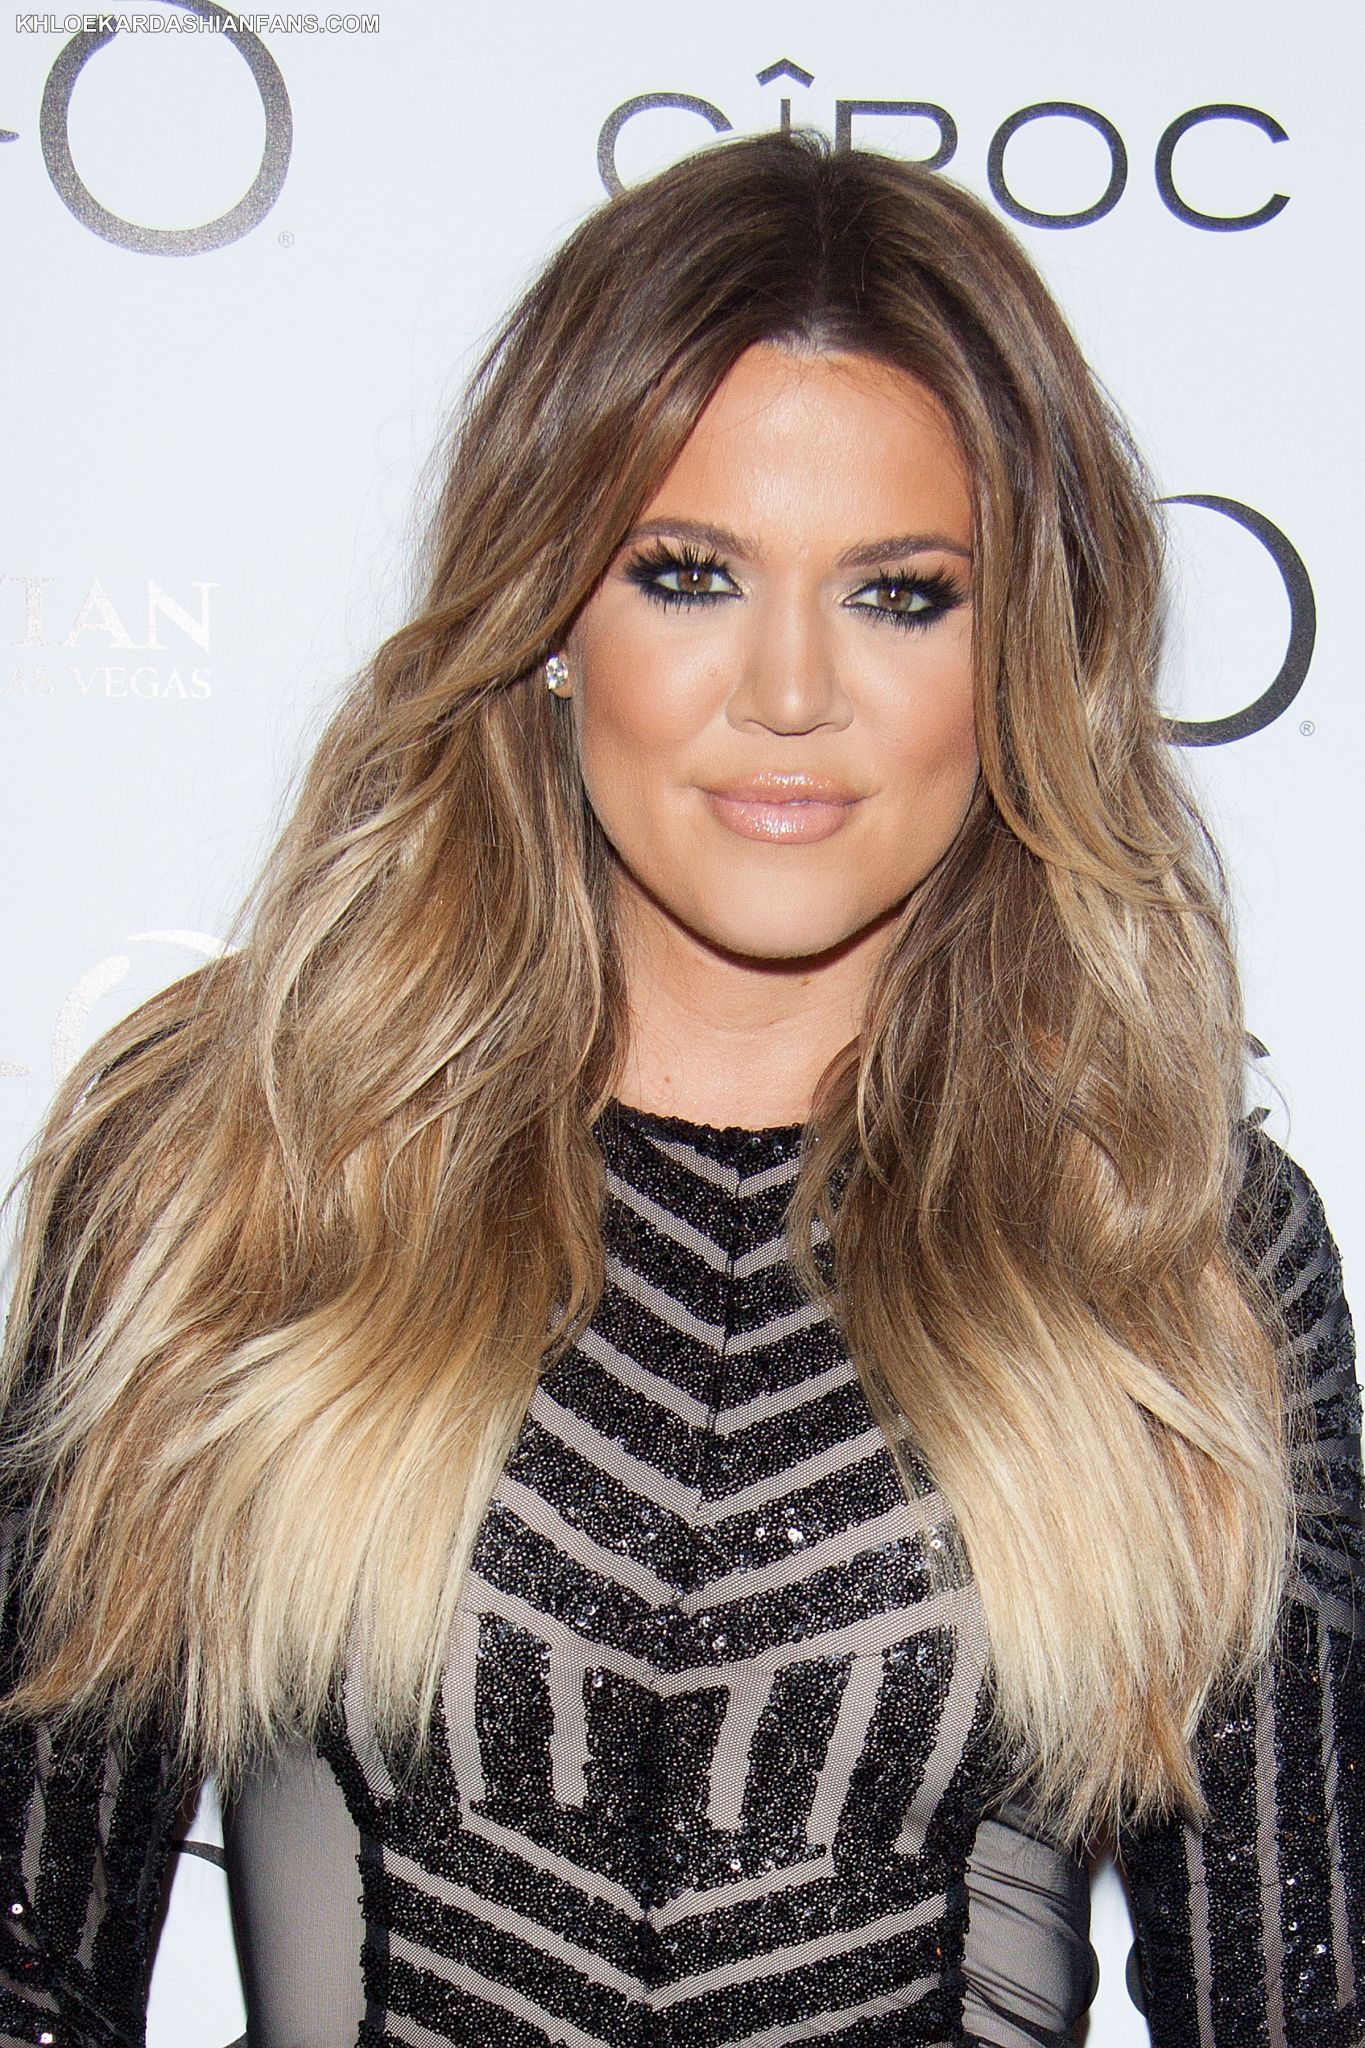 Khloe Kardashian Ombre Hair 30th Birthday At Tao Las Vegas Ombre